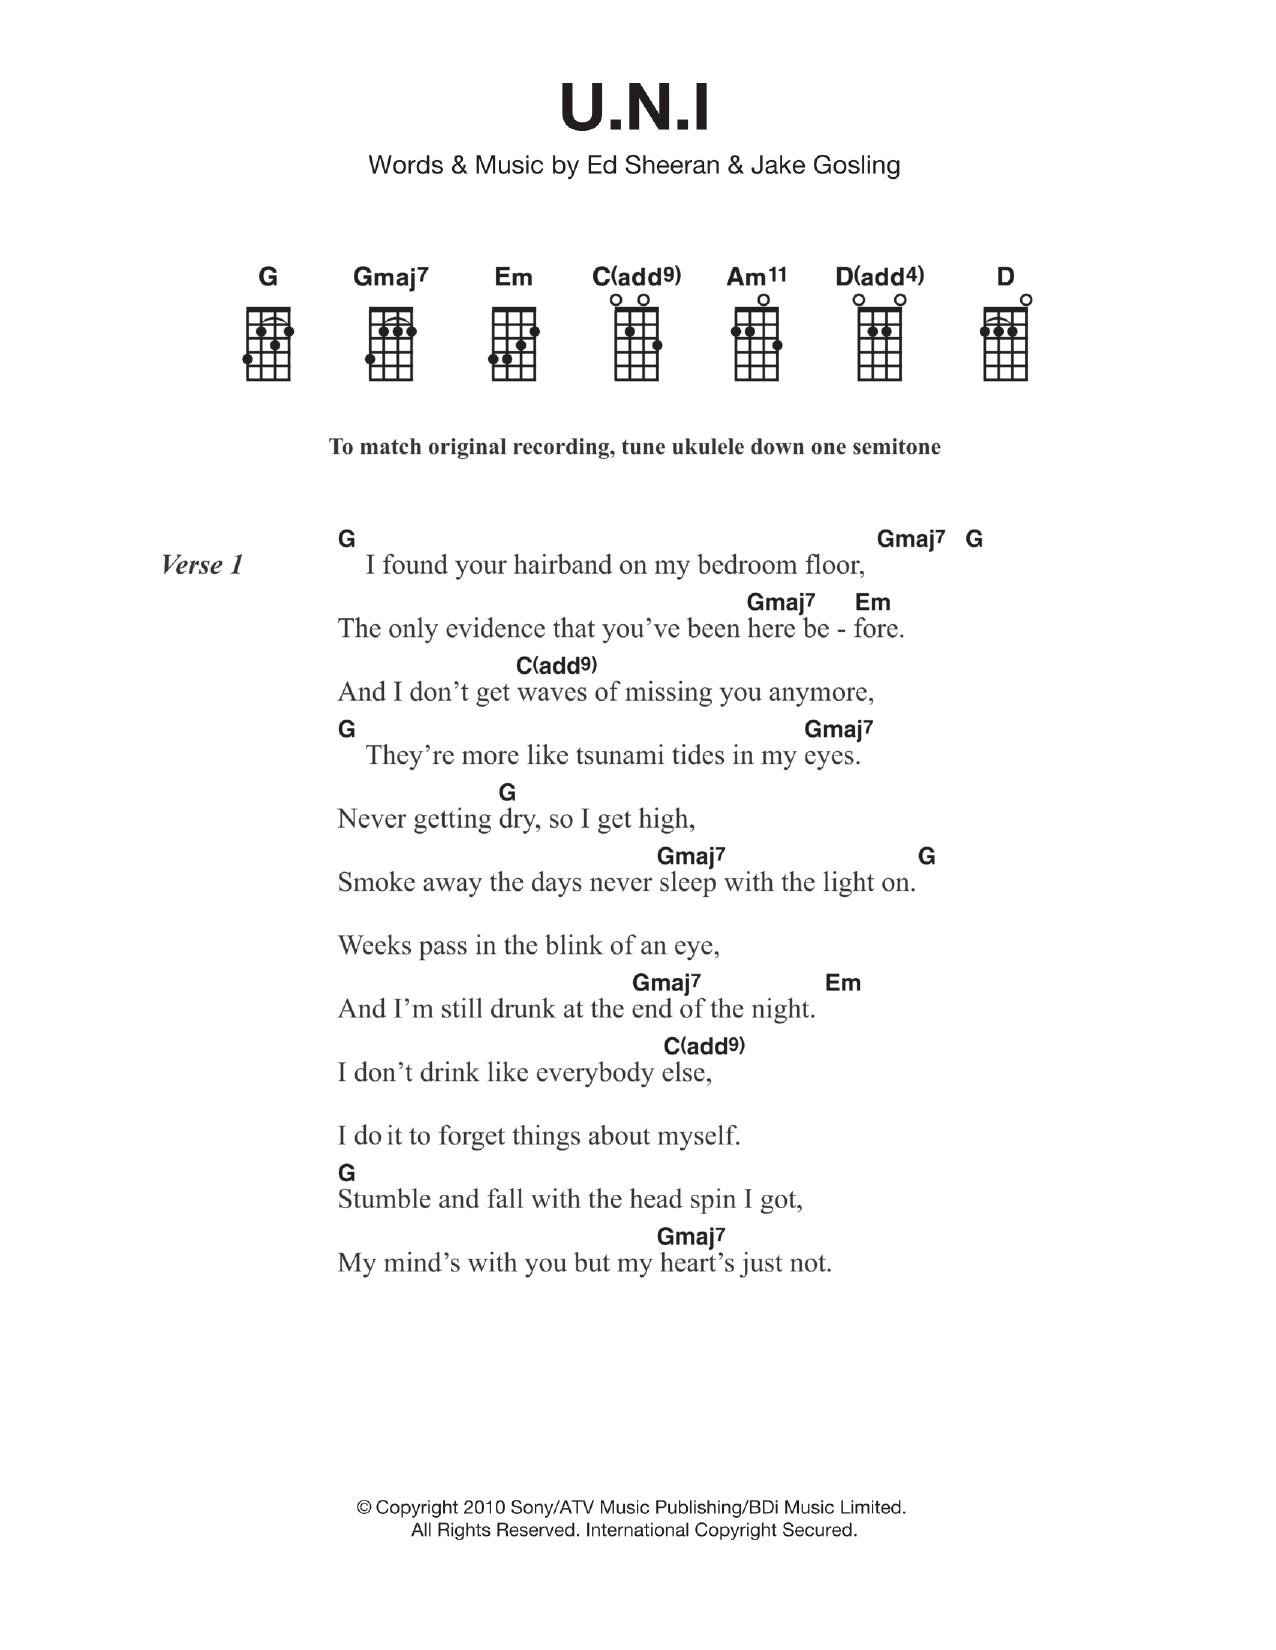 Ed sheeran uni sheet music at stantons sheet music ed sheeran uni hexwebz Choice Image